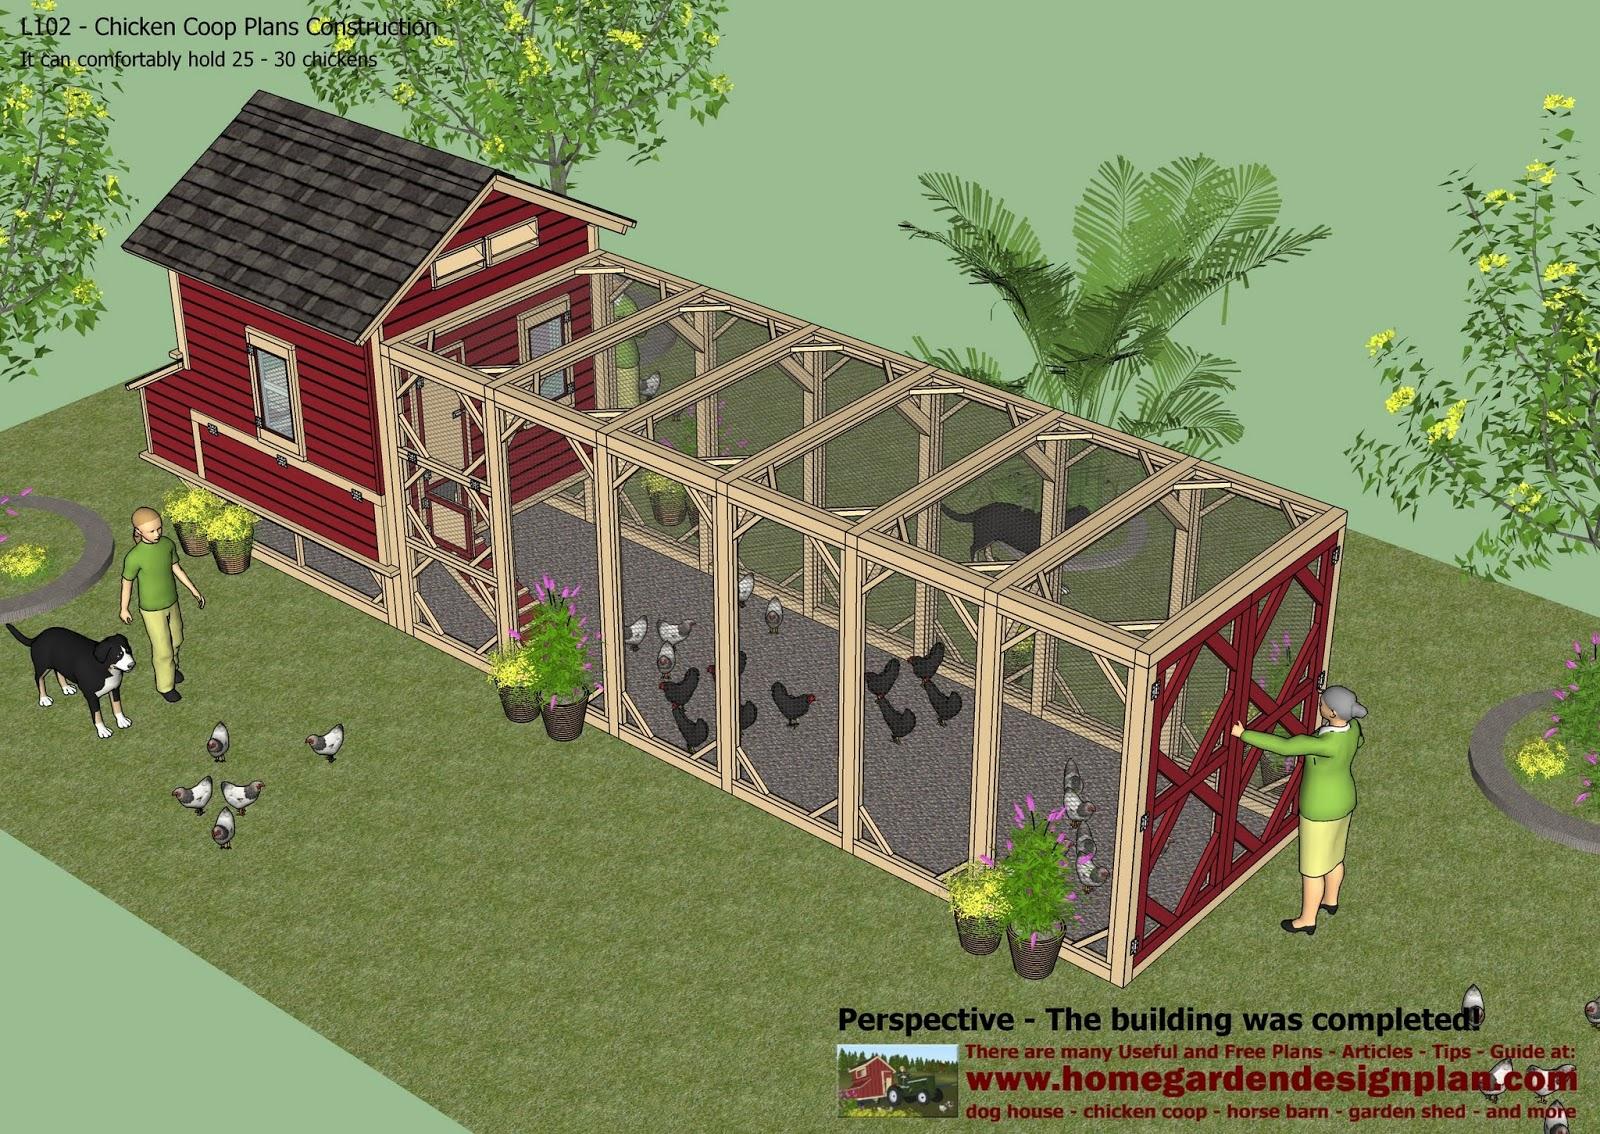 L102 - Chicken Coop Plans Construction - Chicken Coop Design - How To ...